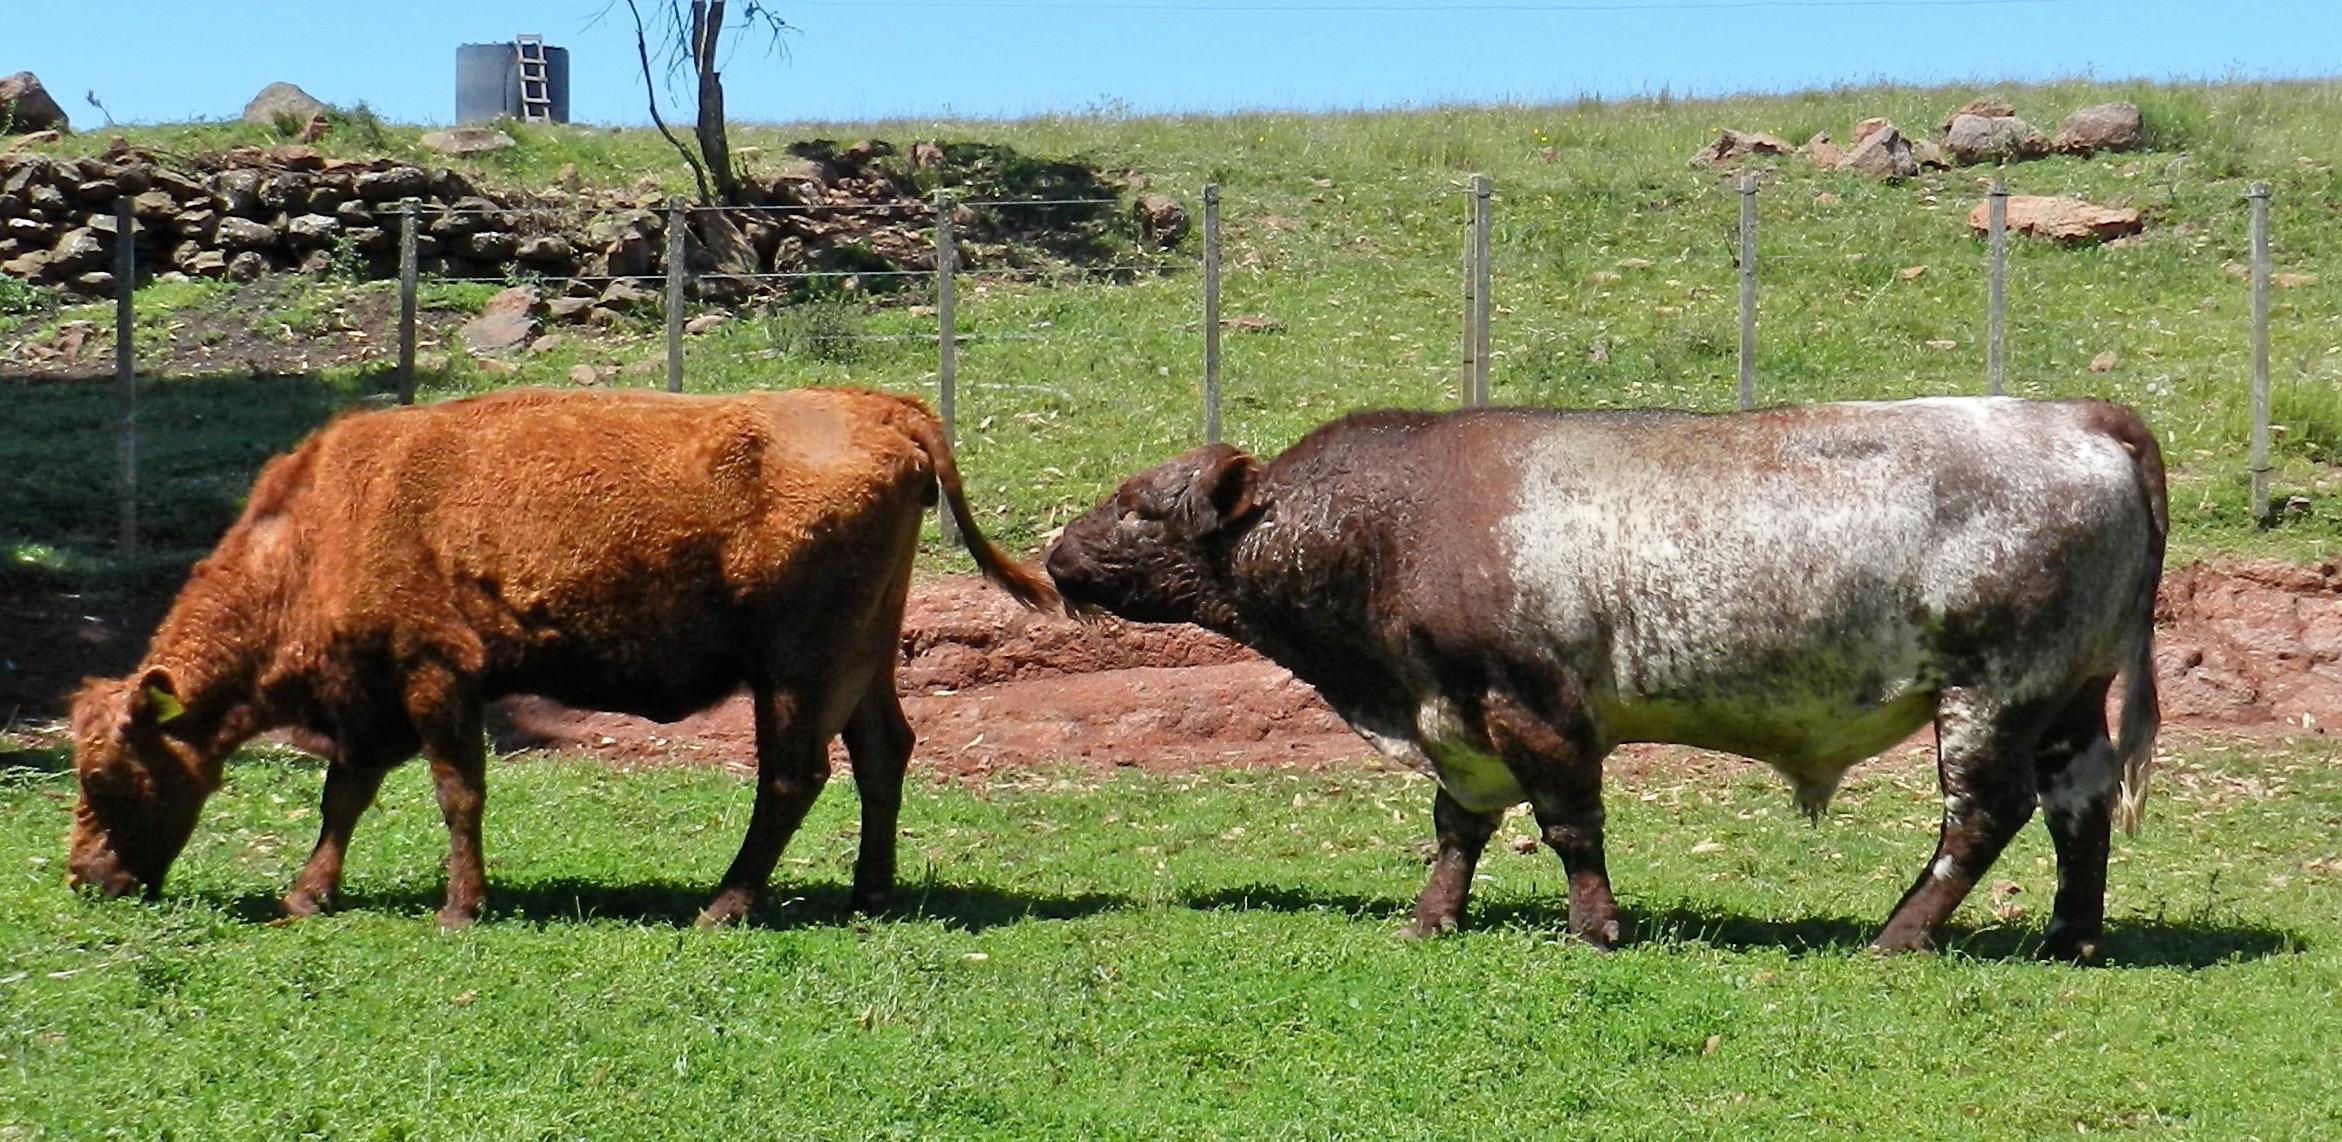 Shorthorn Bull (range conditions) in Uruguay